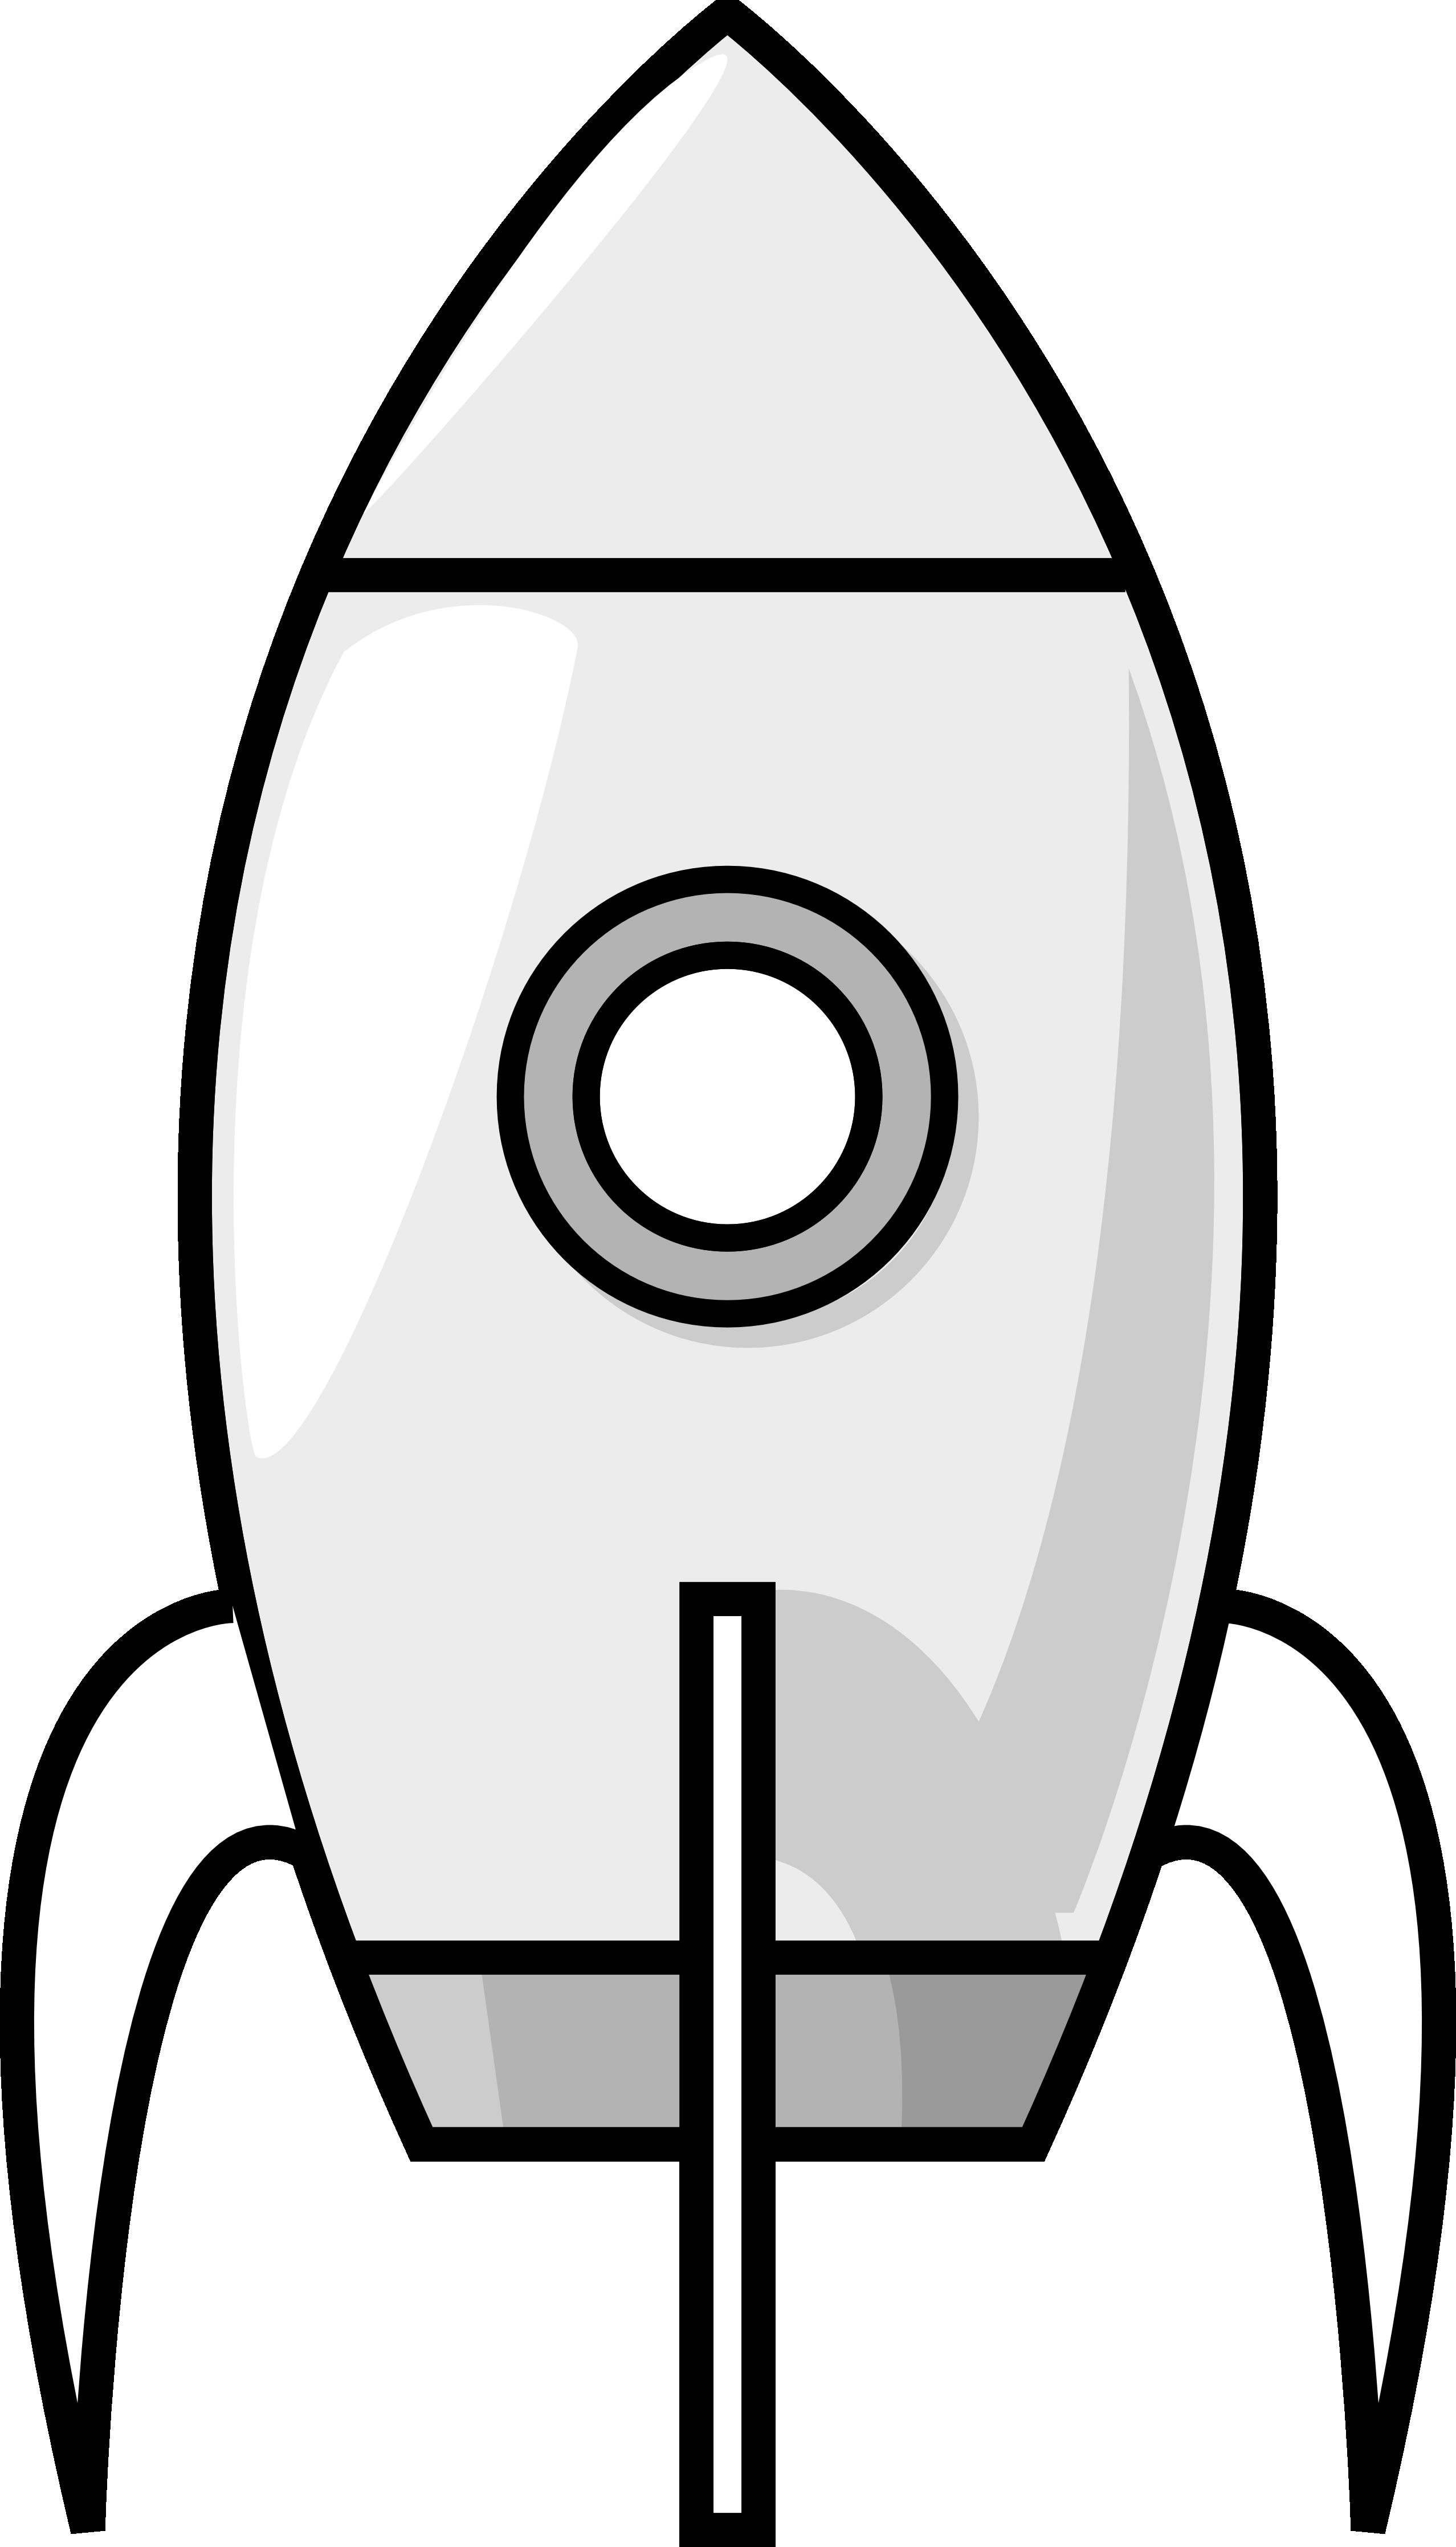 rocket clipart black and white clipart panda free clipart images rh pinterest com